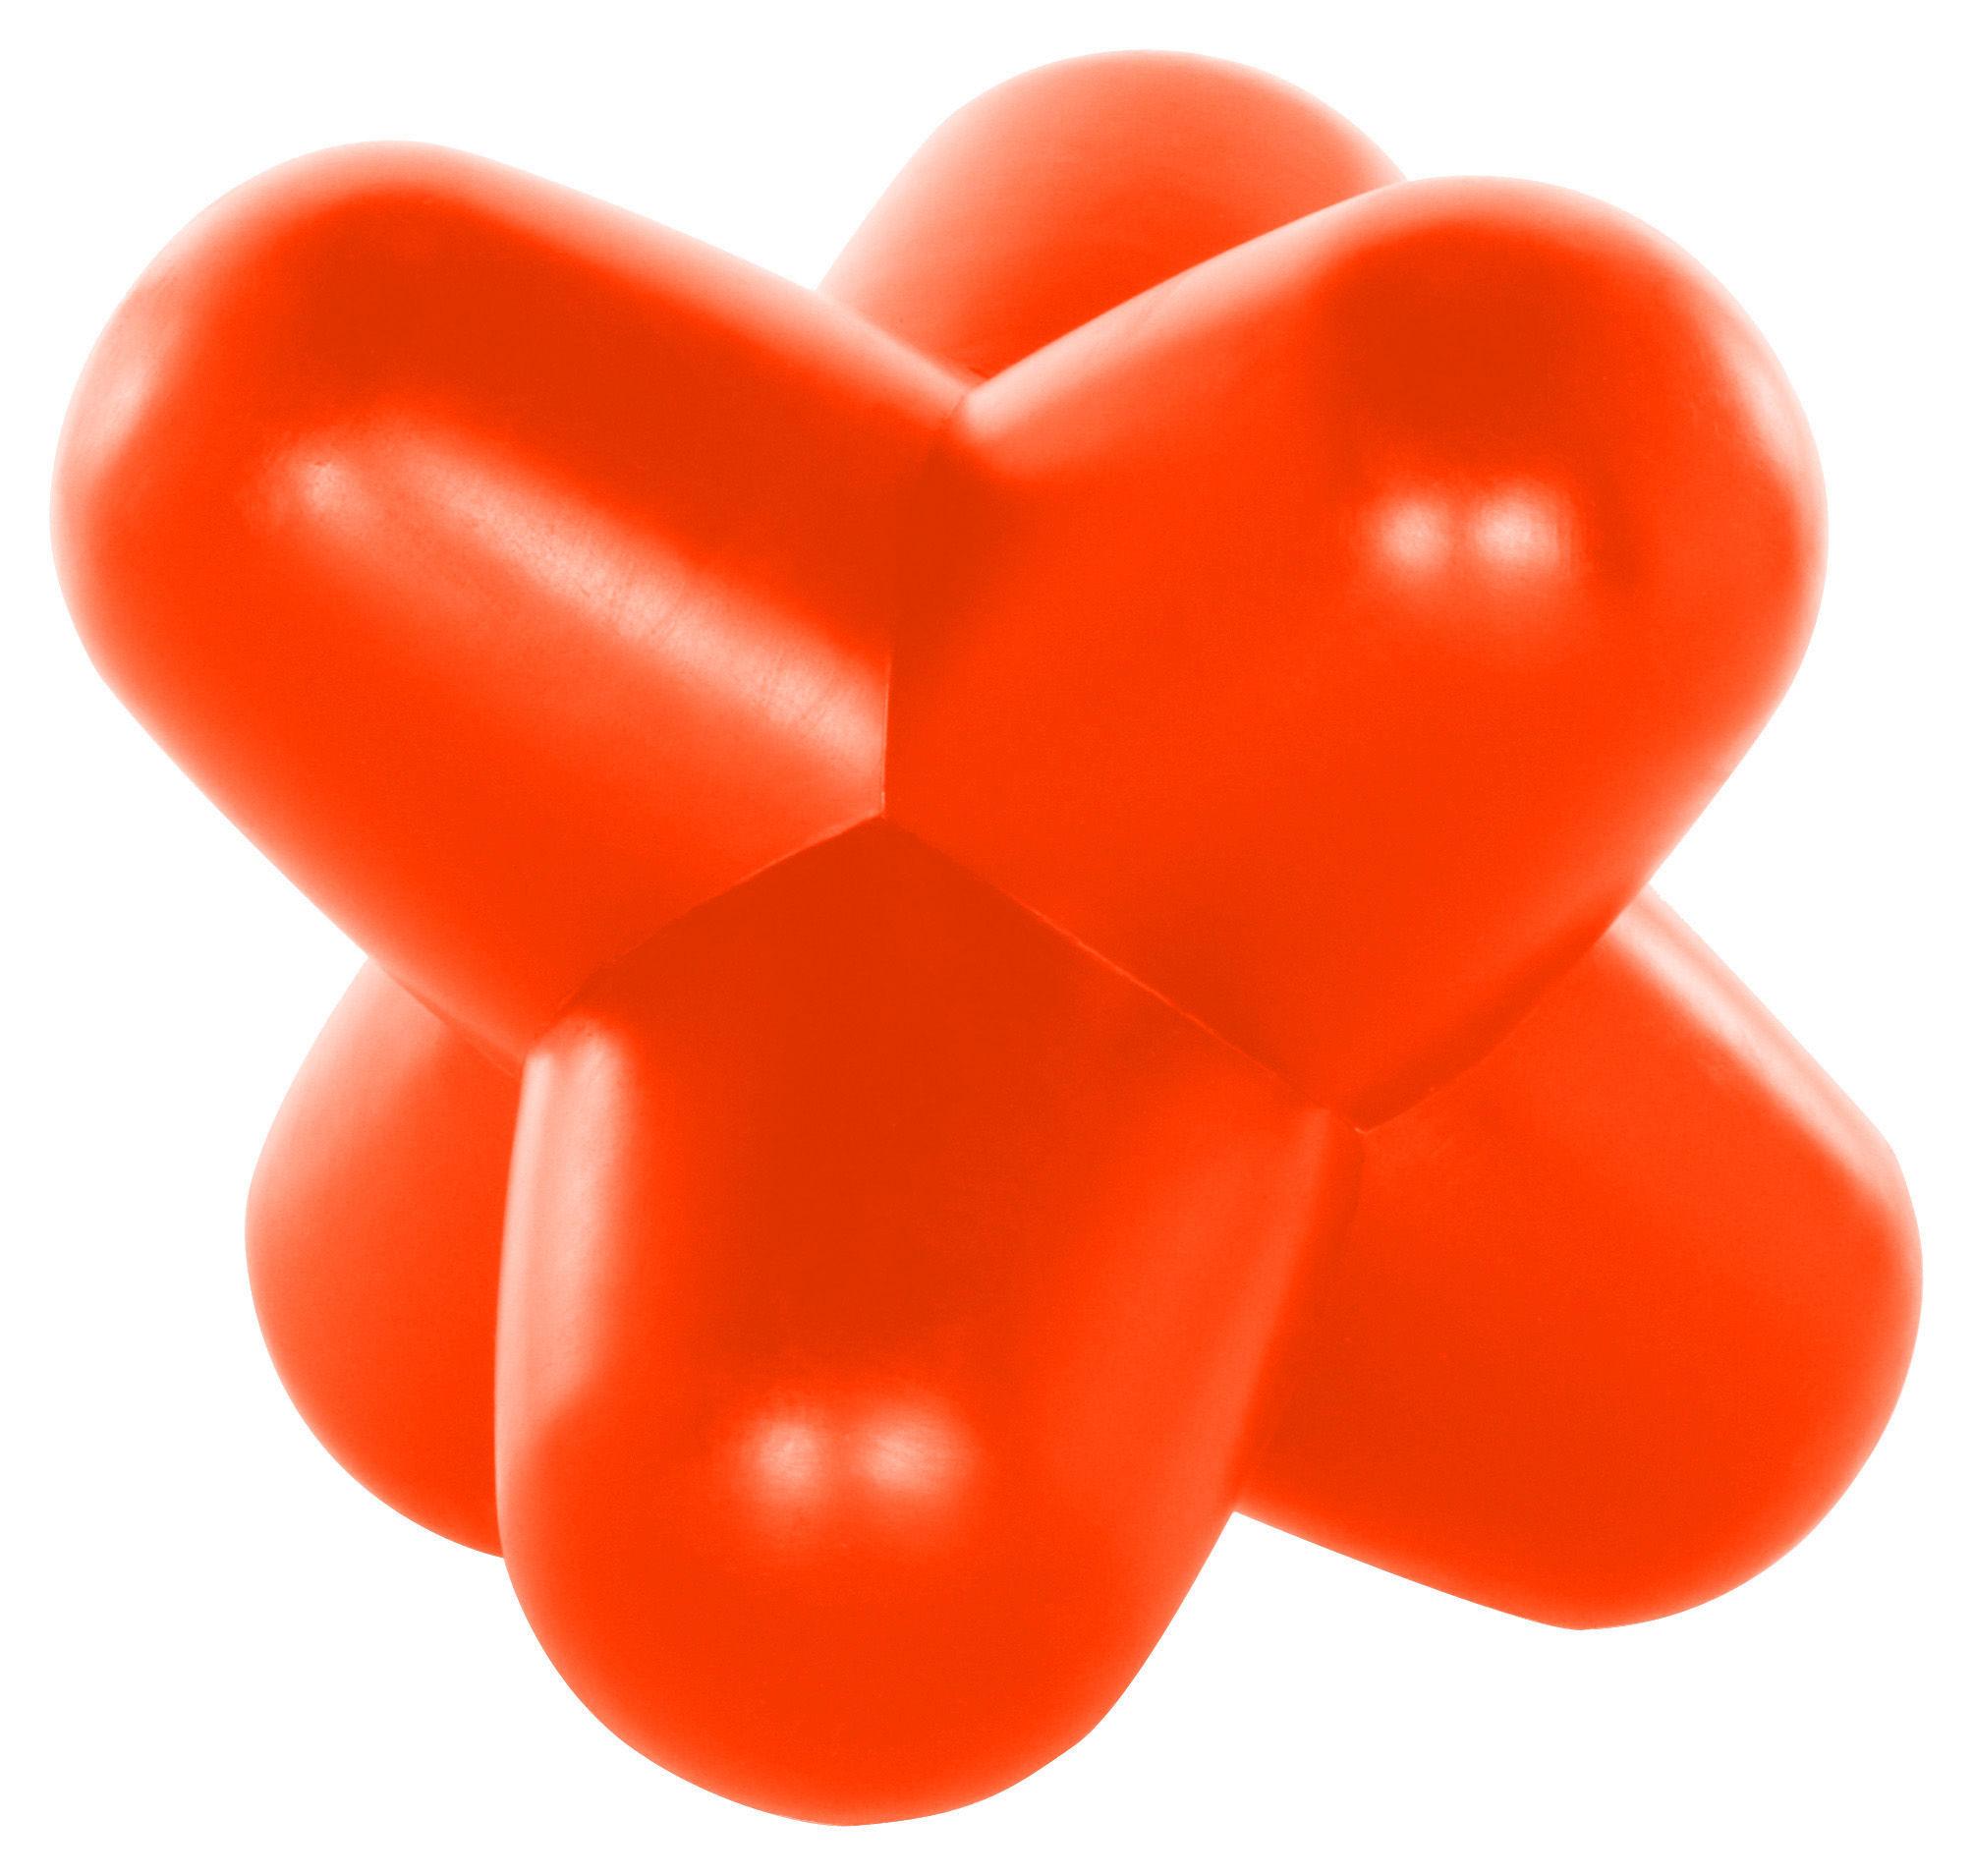 Tom Dixon Lampada Fluoro : Tabouret lumineux jack light fluoro lampe de sol orange